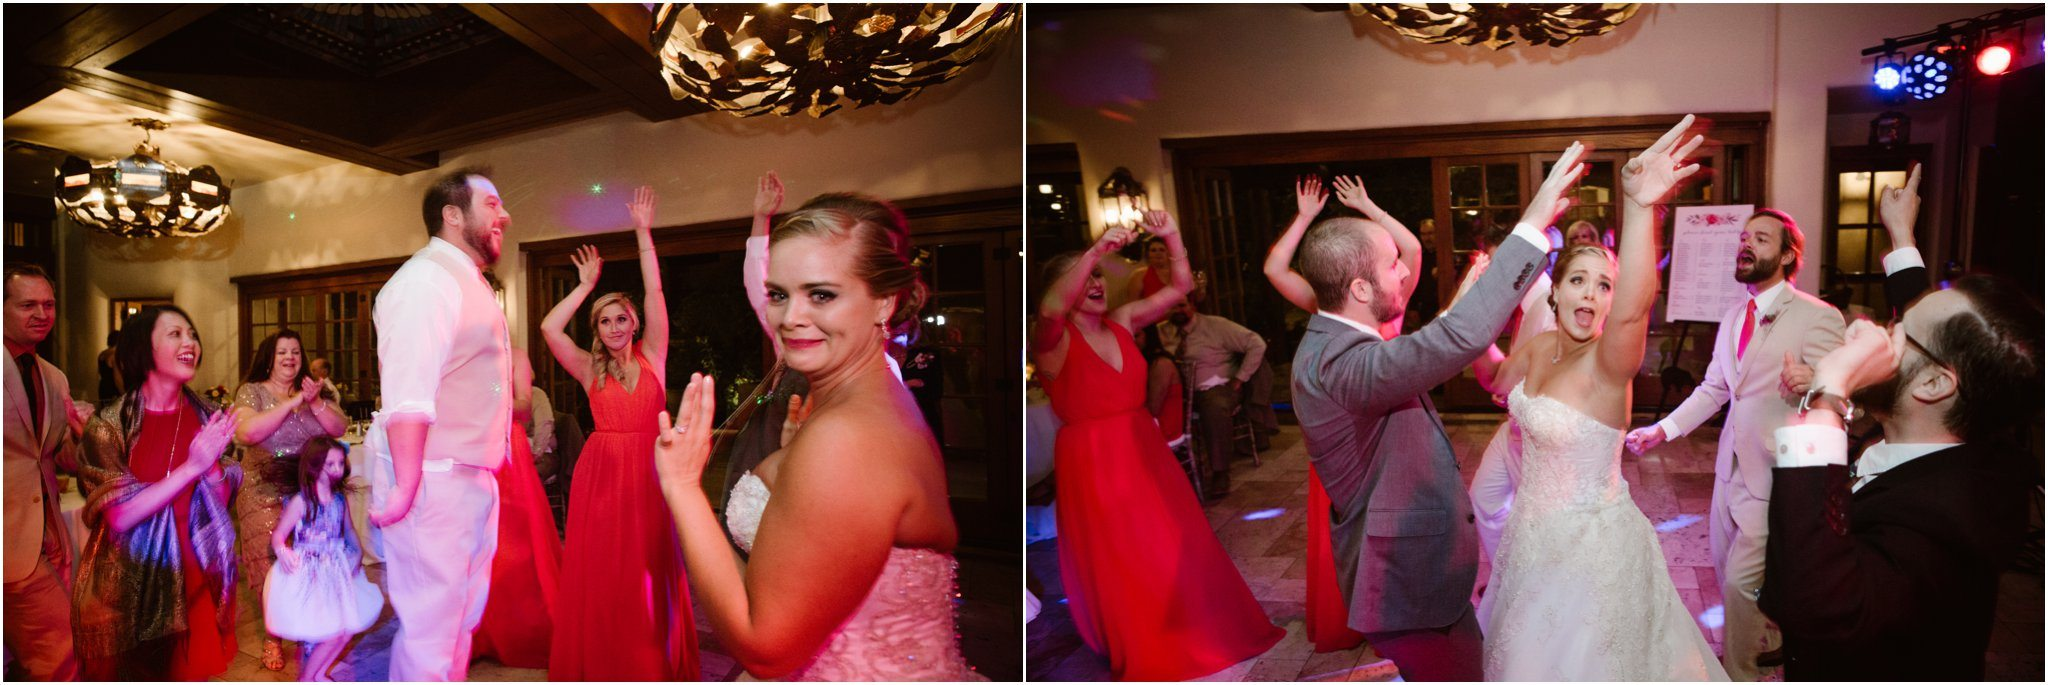 0087albuquerque-wedding-photographer_-santa-fe-wedding-photographer_-southwest-wedding-photography_-blue-rose-studio